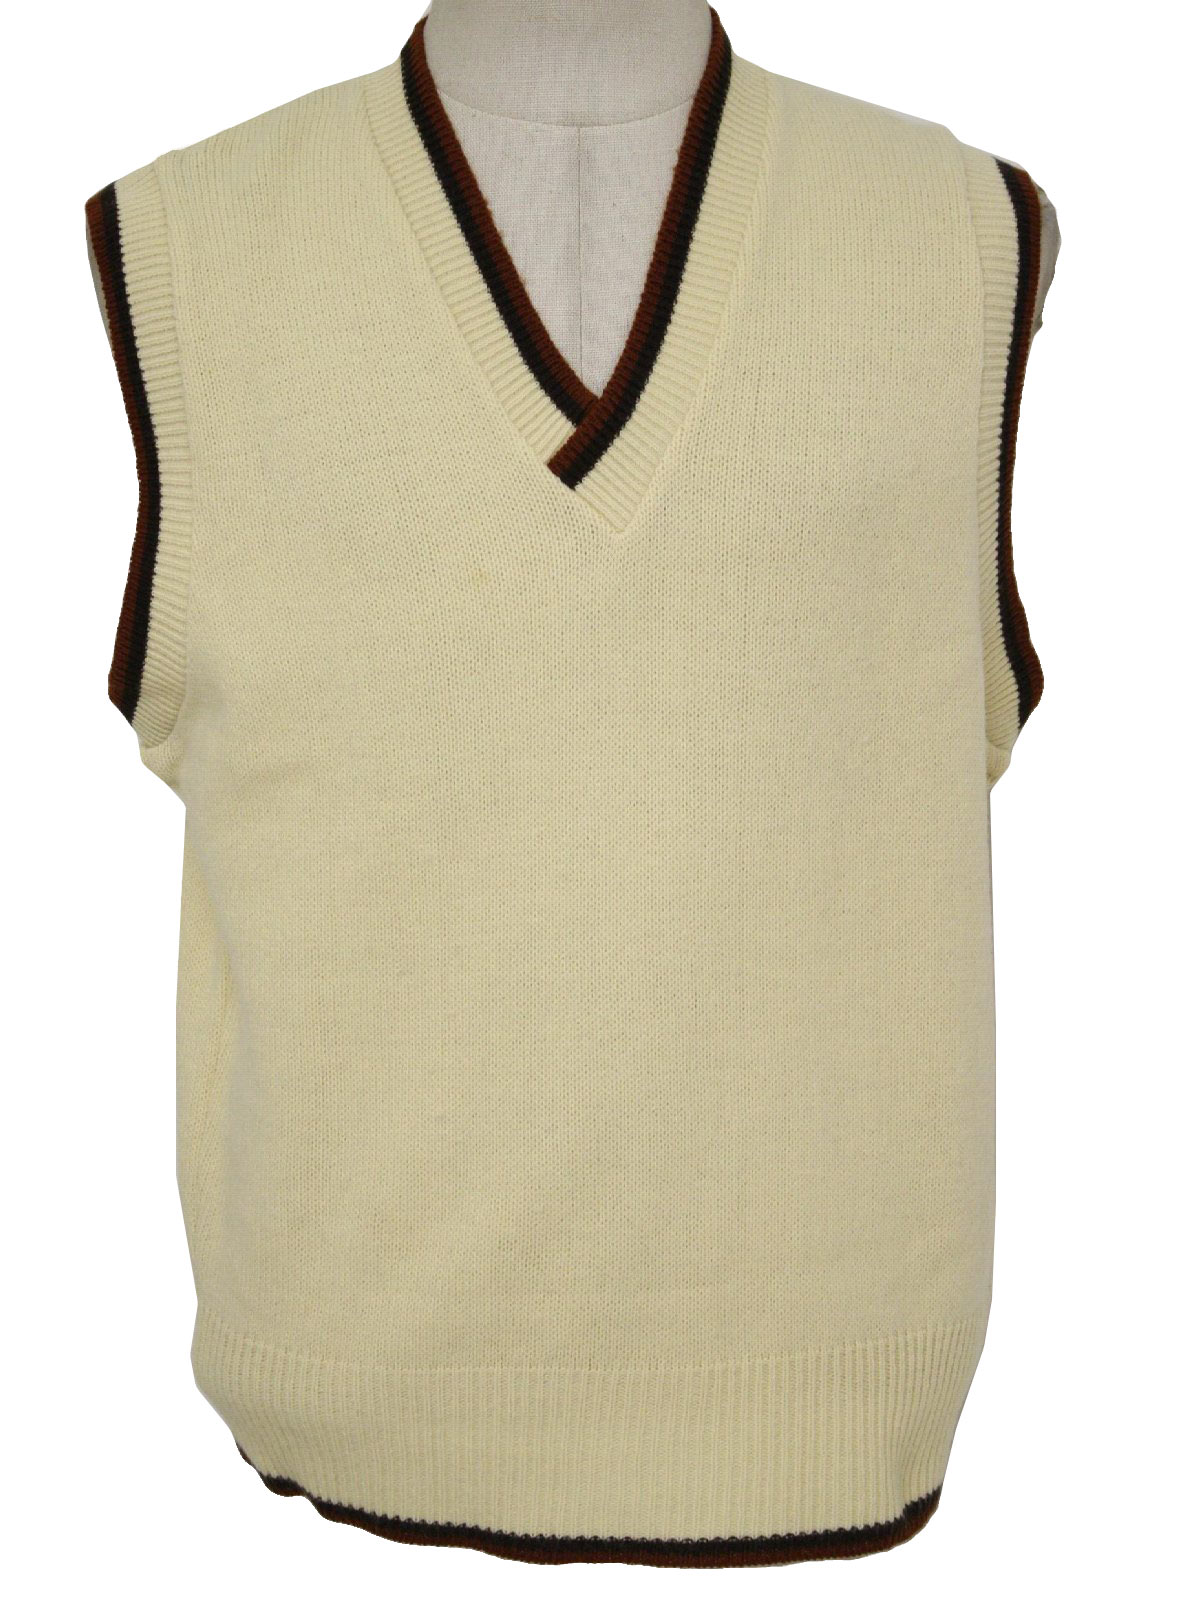 Cream Sweater Vest Baggage Clothing